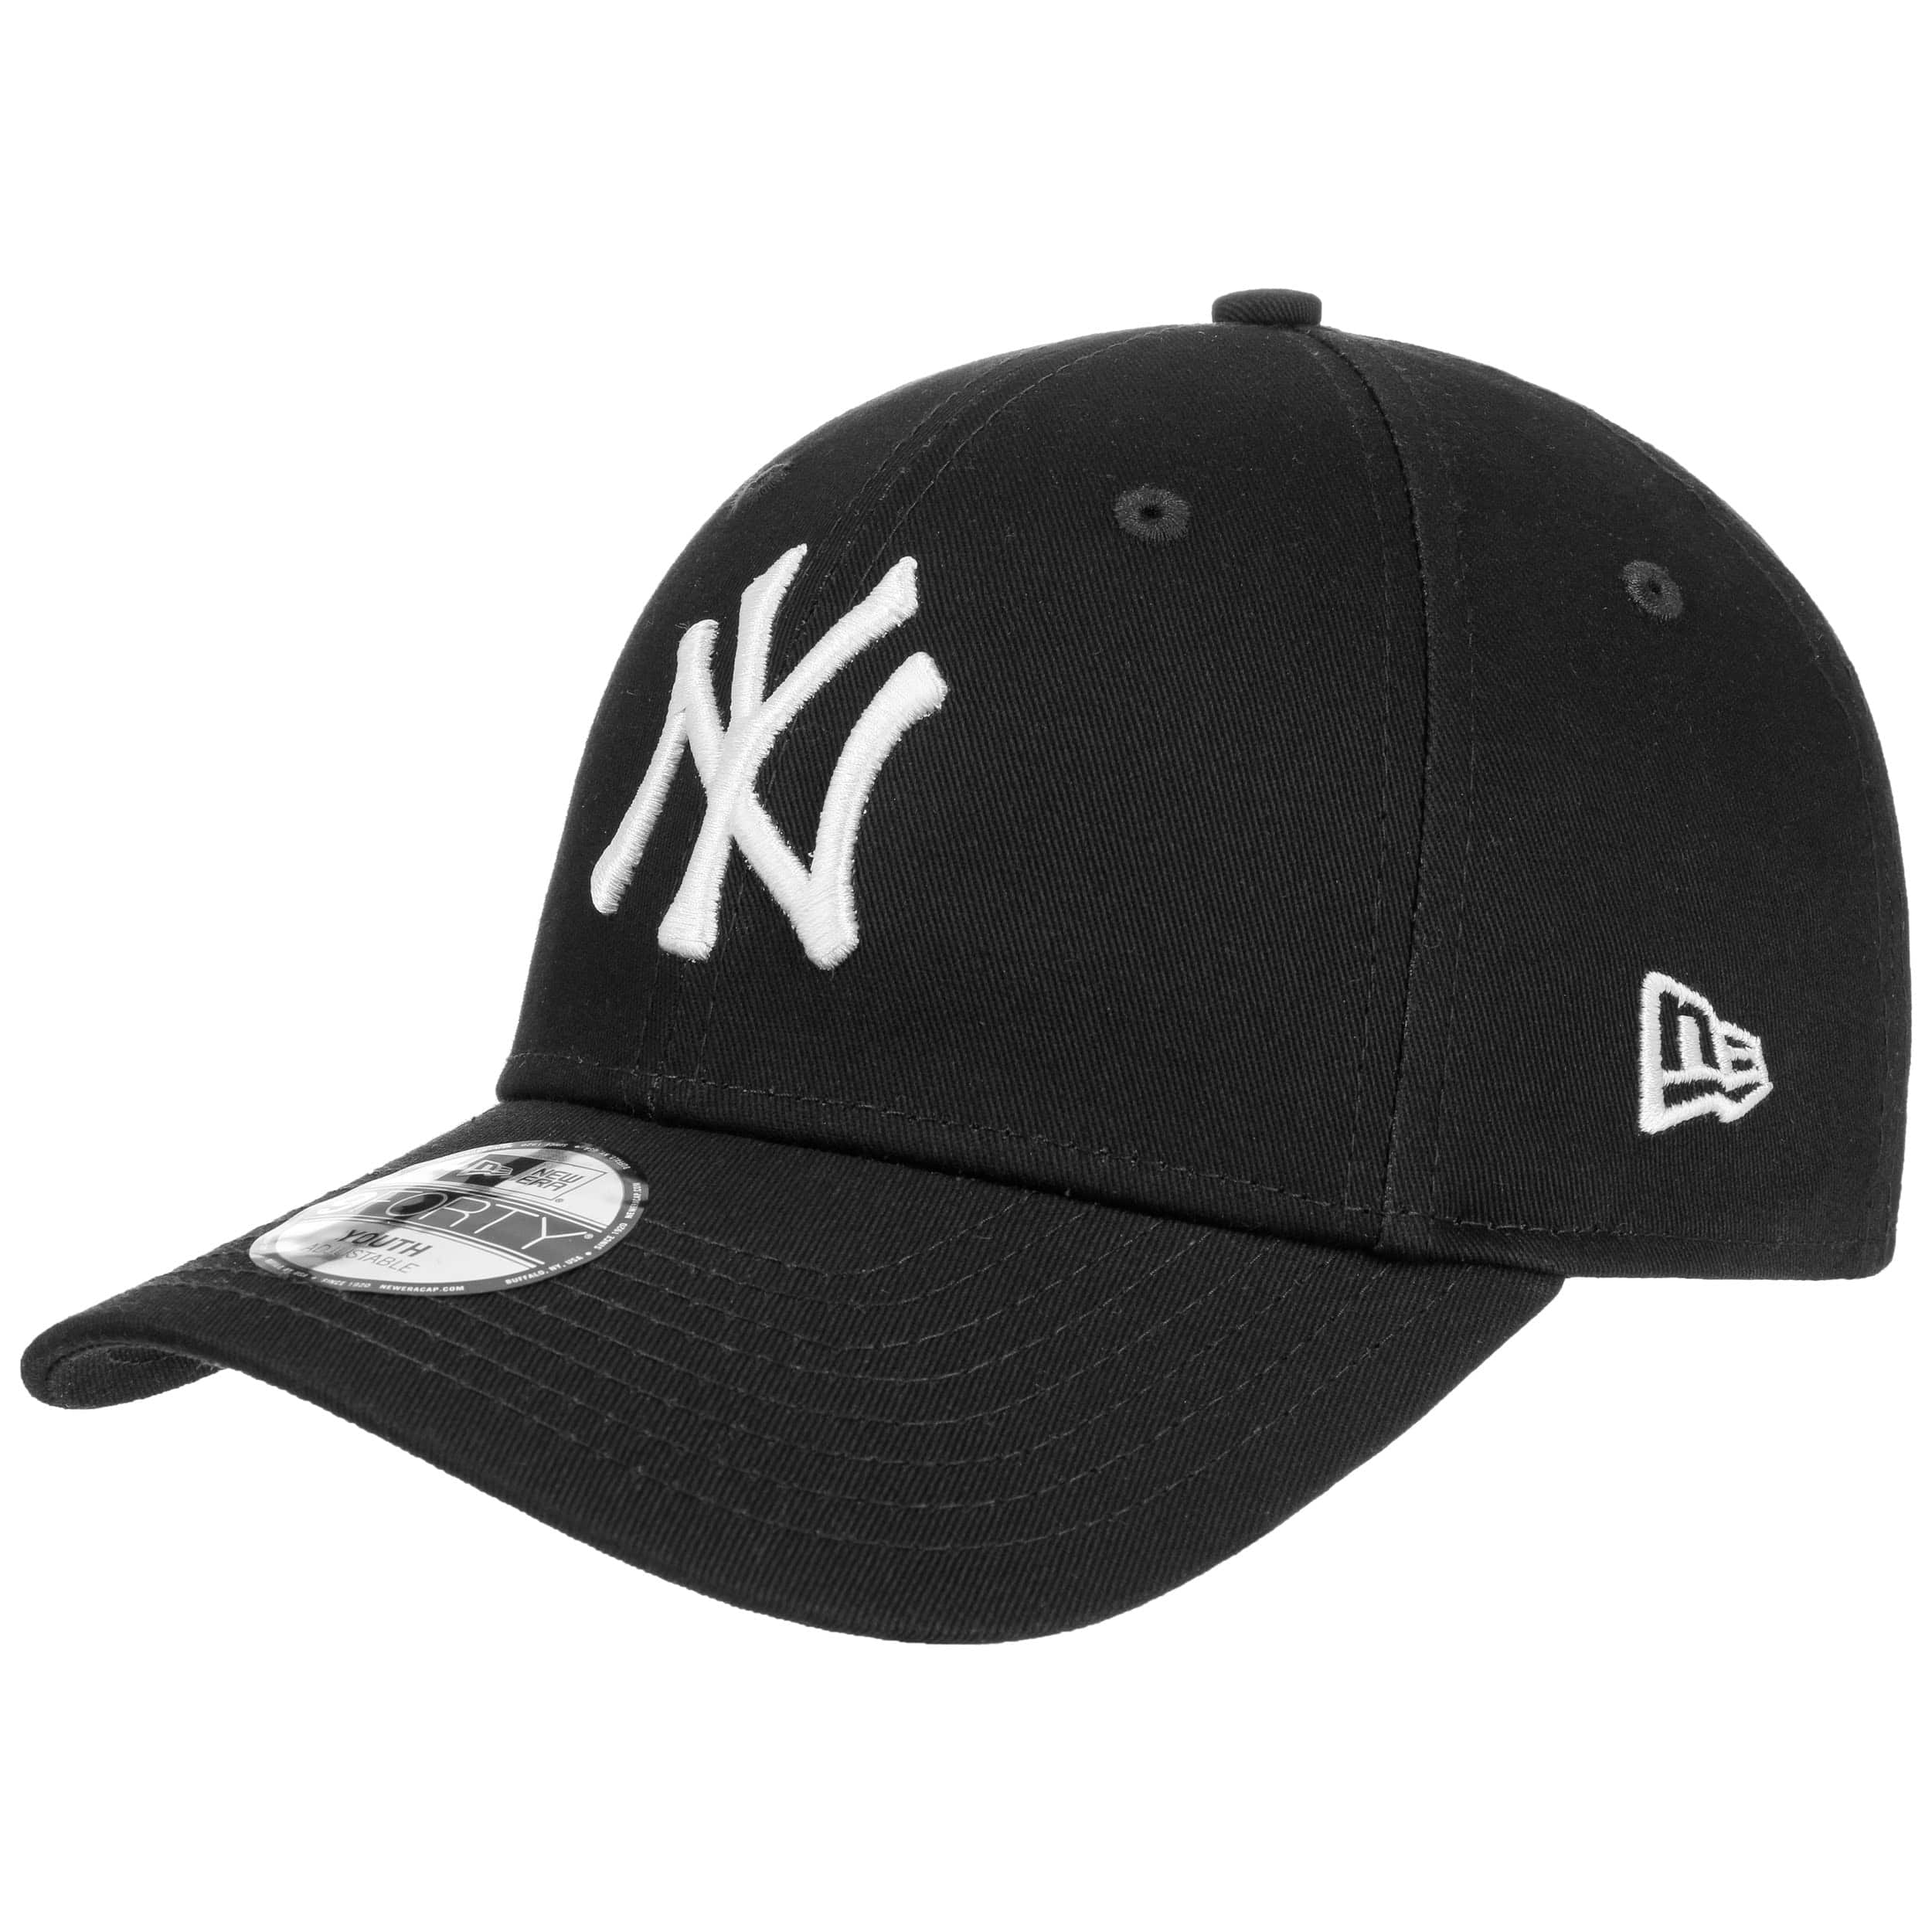 Online-Verkauf UK-Shop Ruf zuerst 9Forty JUNIOR NY Yankees Cap by New Era